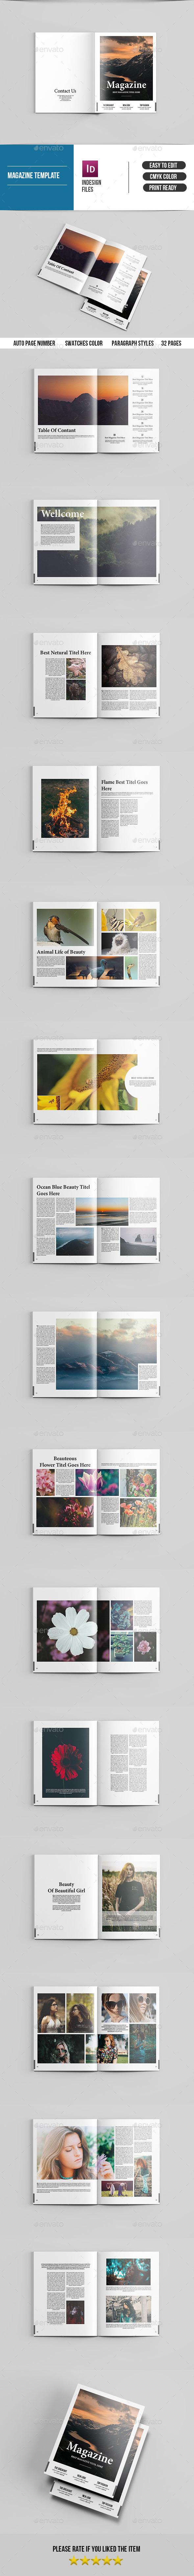 Minimal Magazine Template-V18 - Magazines Print Templates